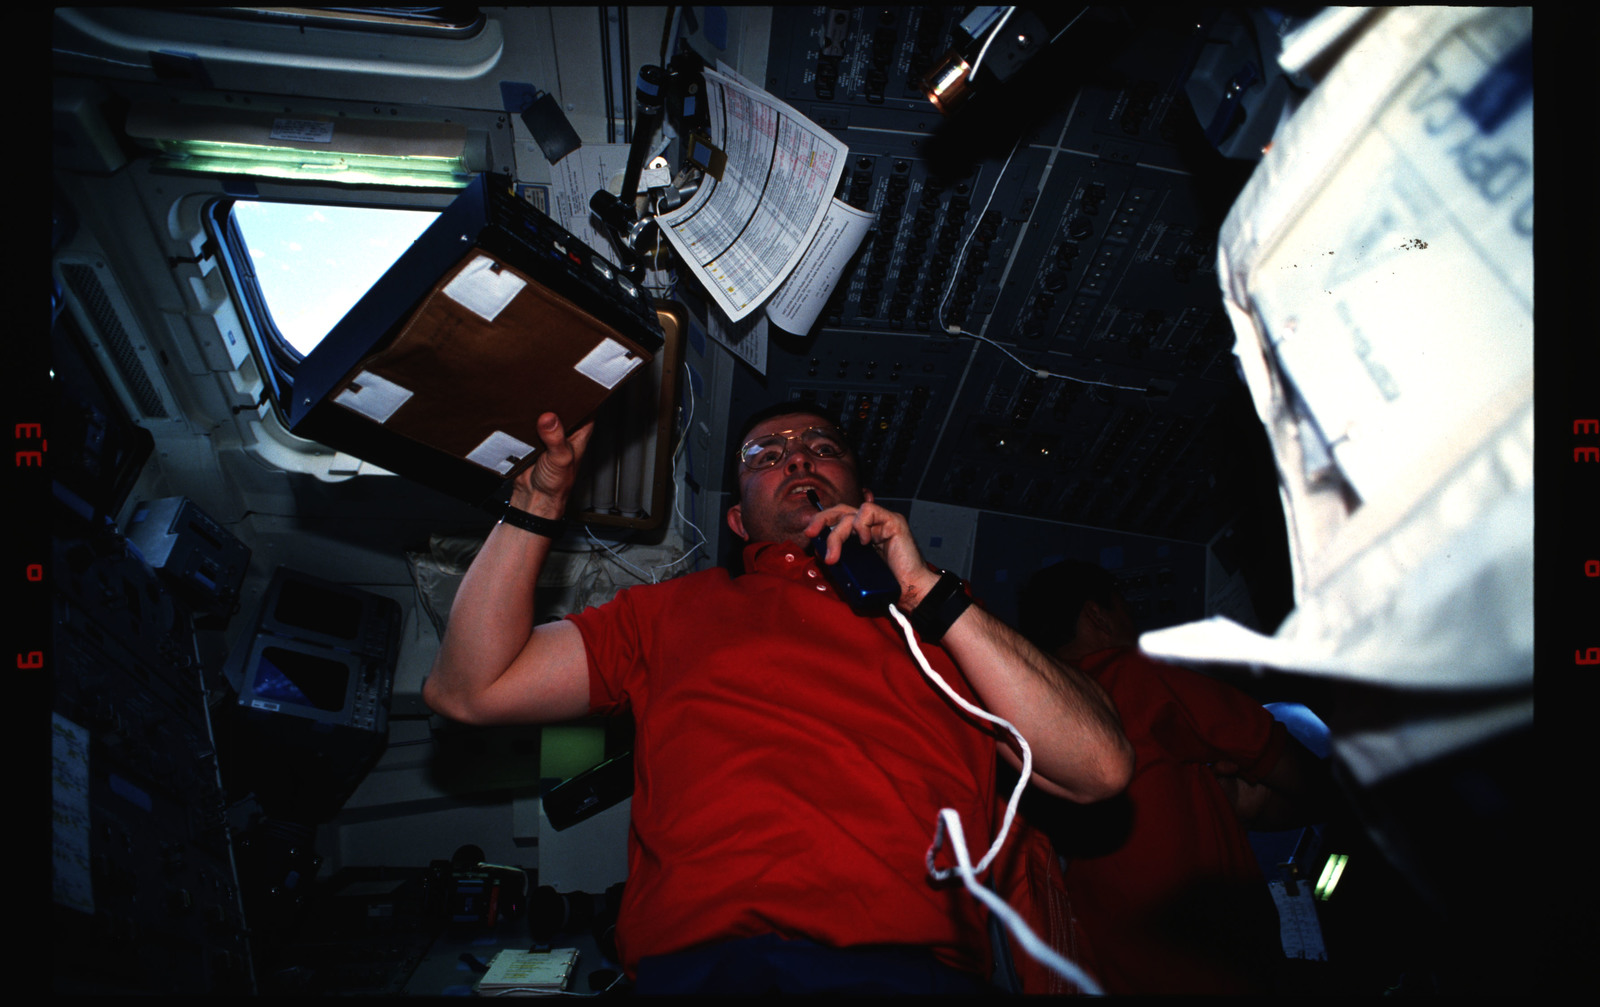 S37-17-032 - STS-037 - STS-37 crew activities